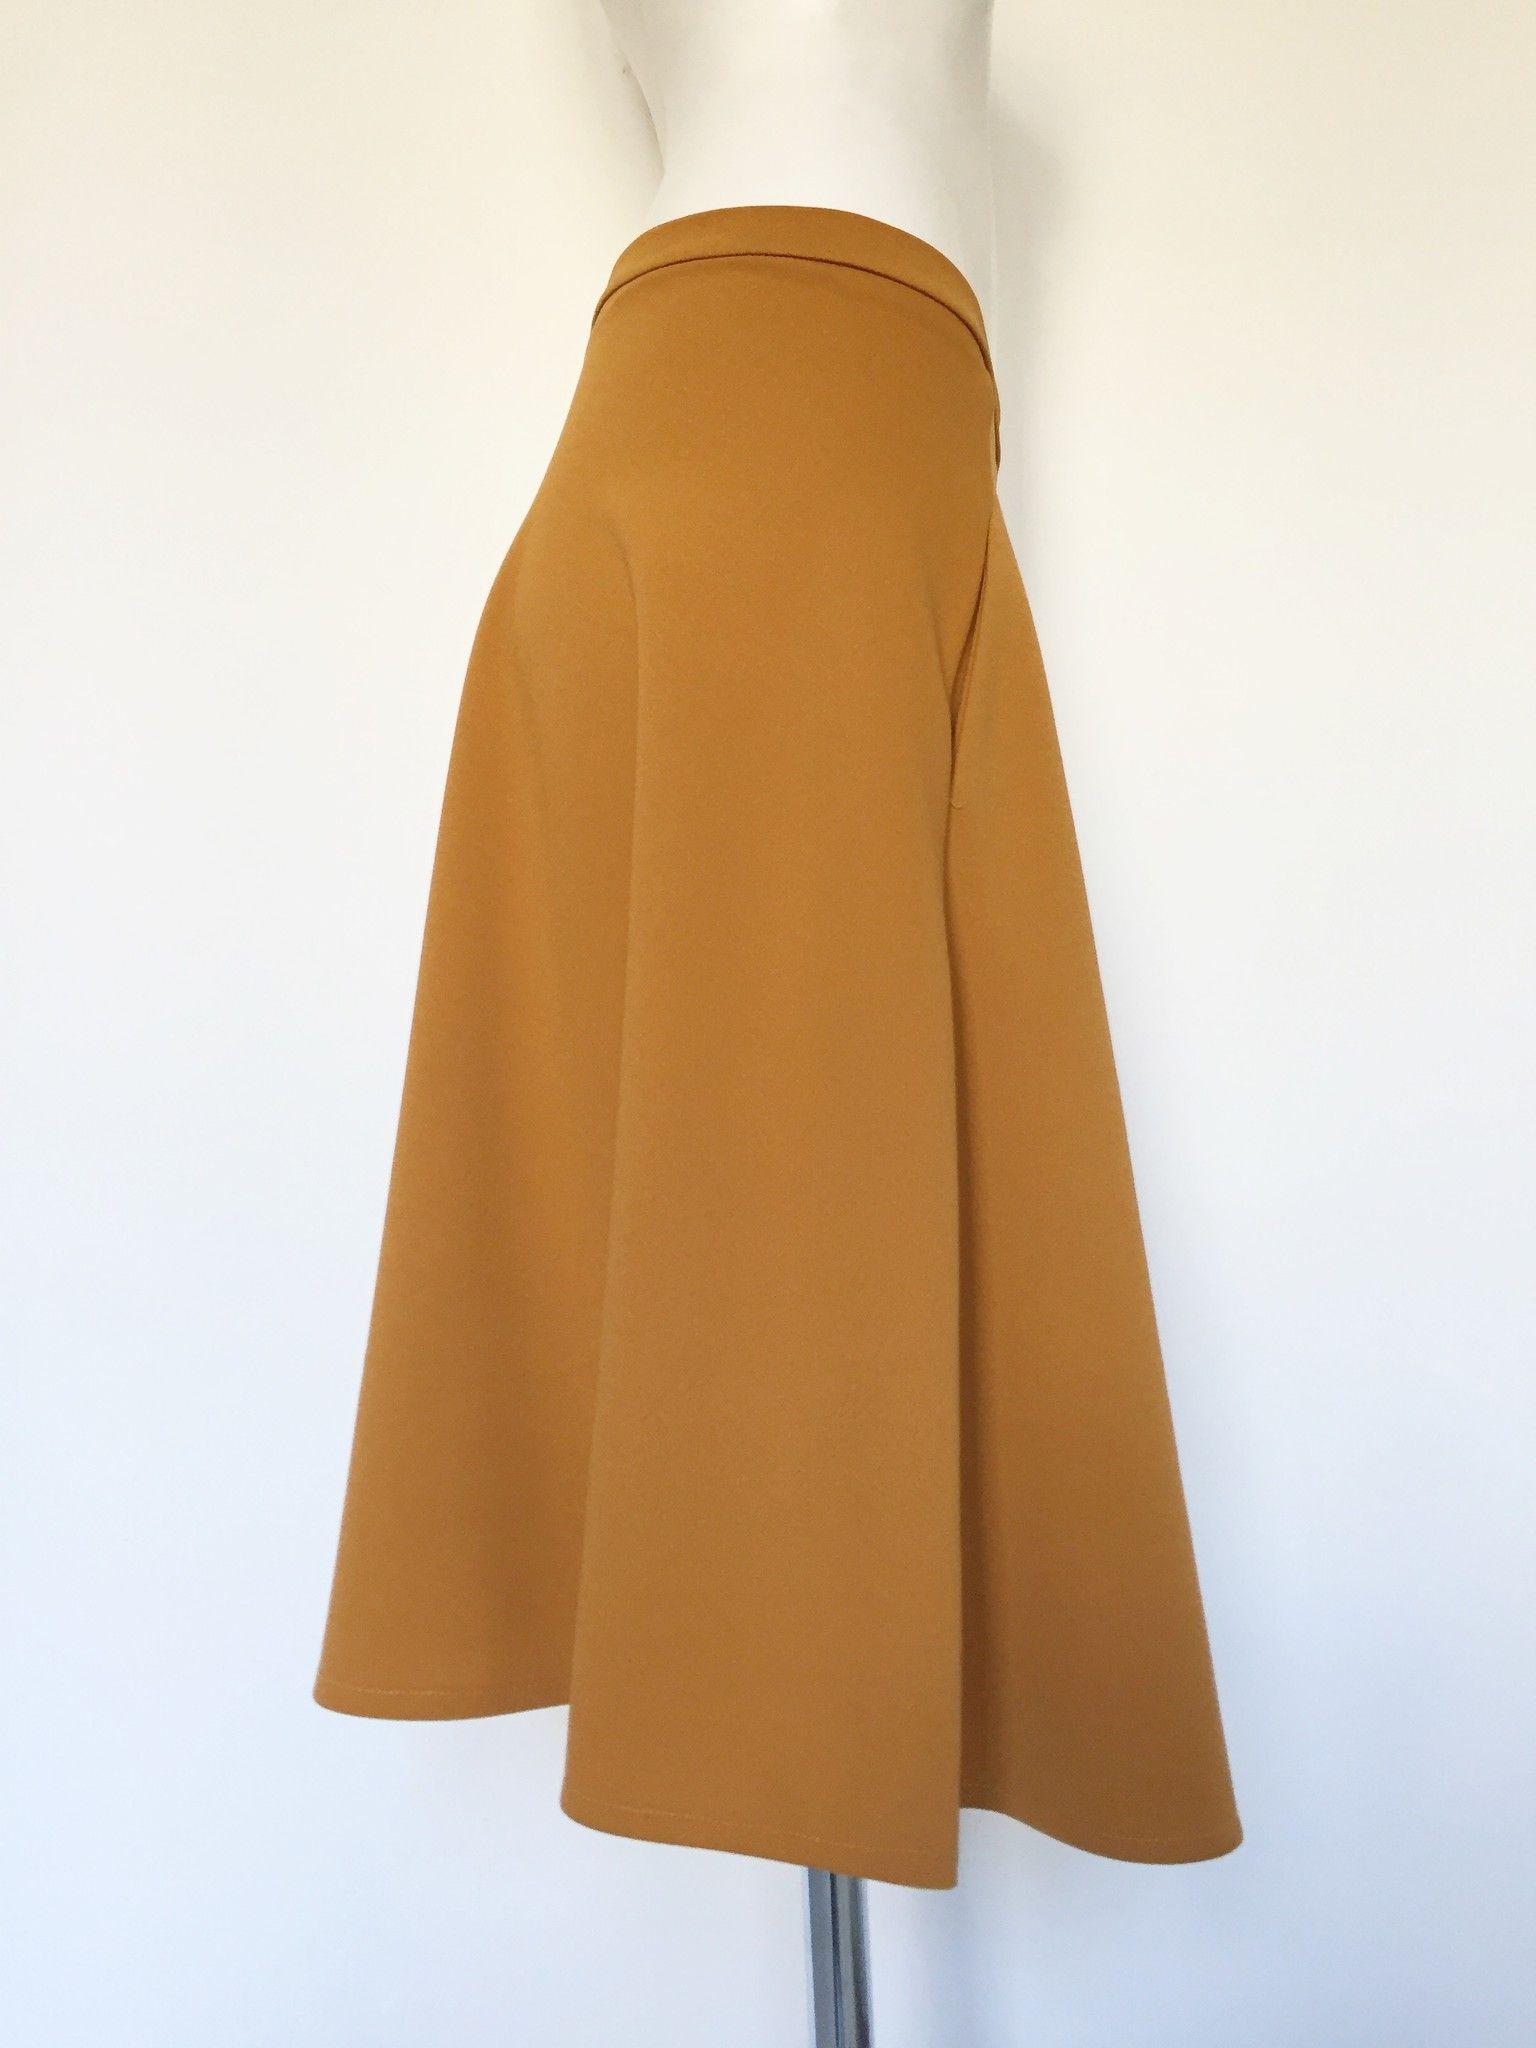 LadyBug Flared Skirt with Pockets Cod.96232